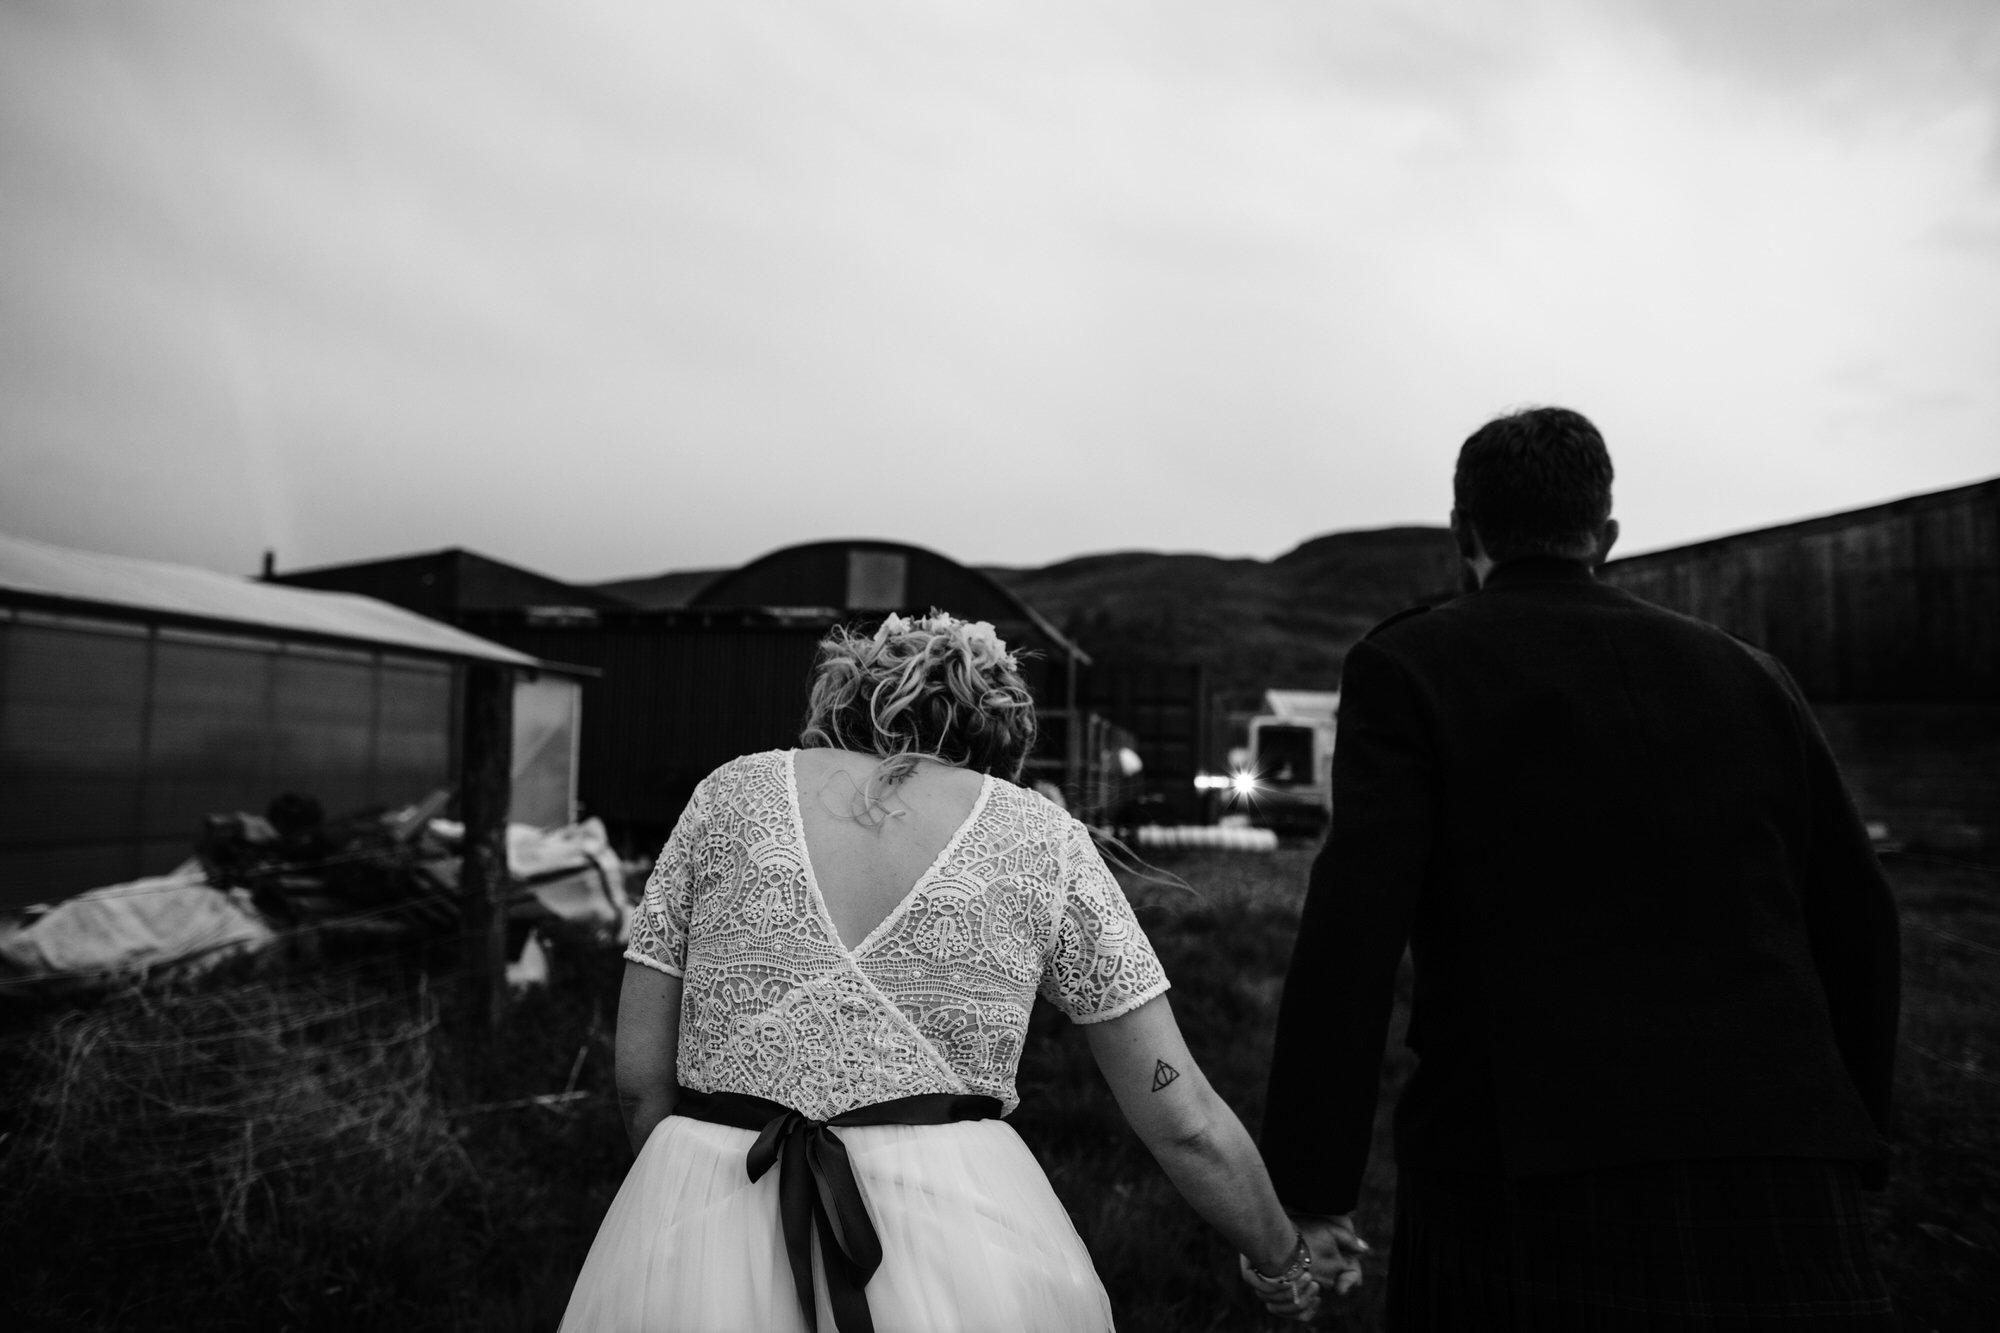 074 TIN SHED KNOCKRAICH WEDDING AUSTRIAN SCOTTISH ZOE ALEXANDRA PHOTOGRAPHY